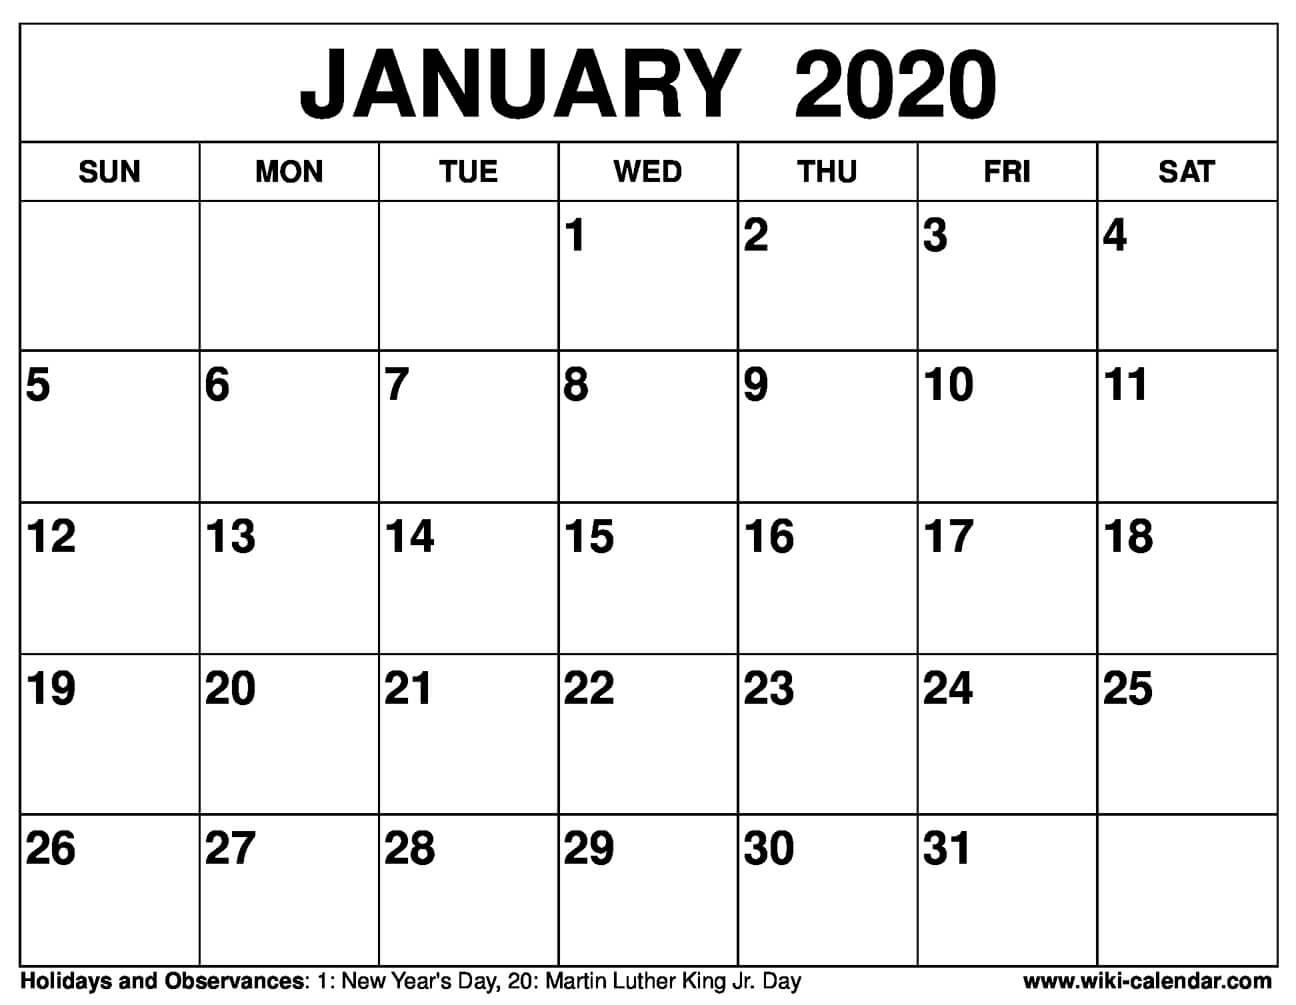 Free Printable January 2020 Calendar in January 2020 Calendar